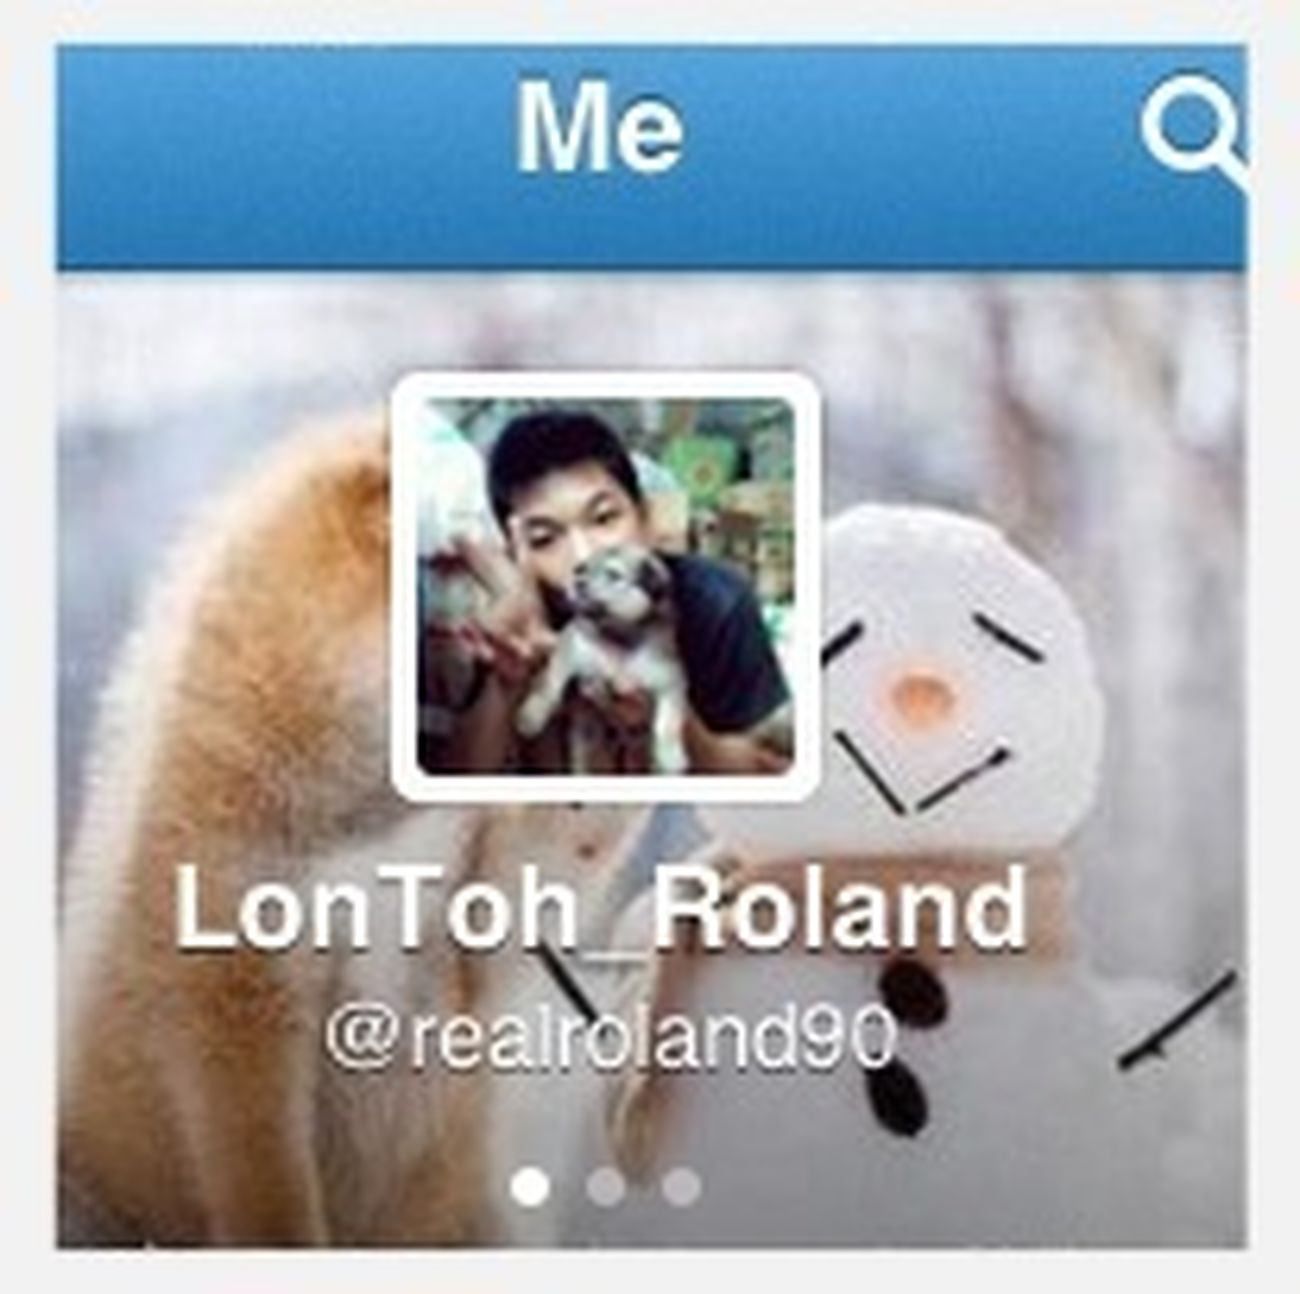 Follow My Twitter @realroland90 Please